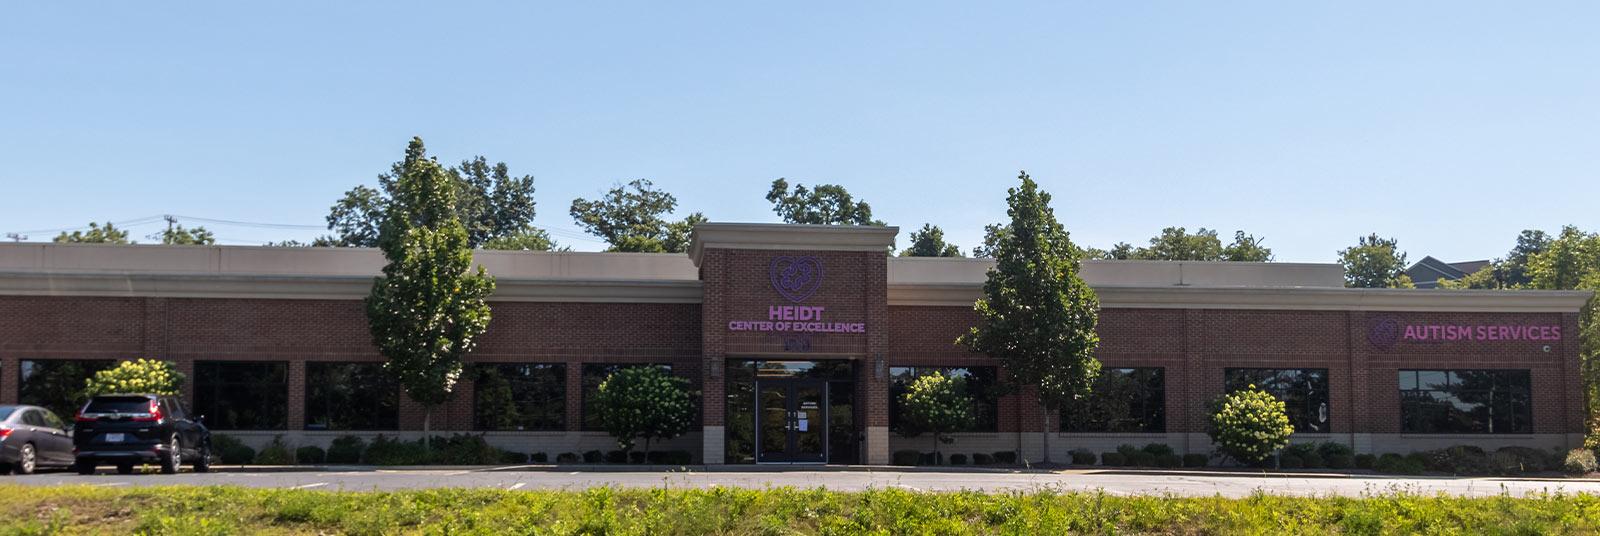 Street view of The Children's Center Red Bank Addition in Cincinnati, Ohio.